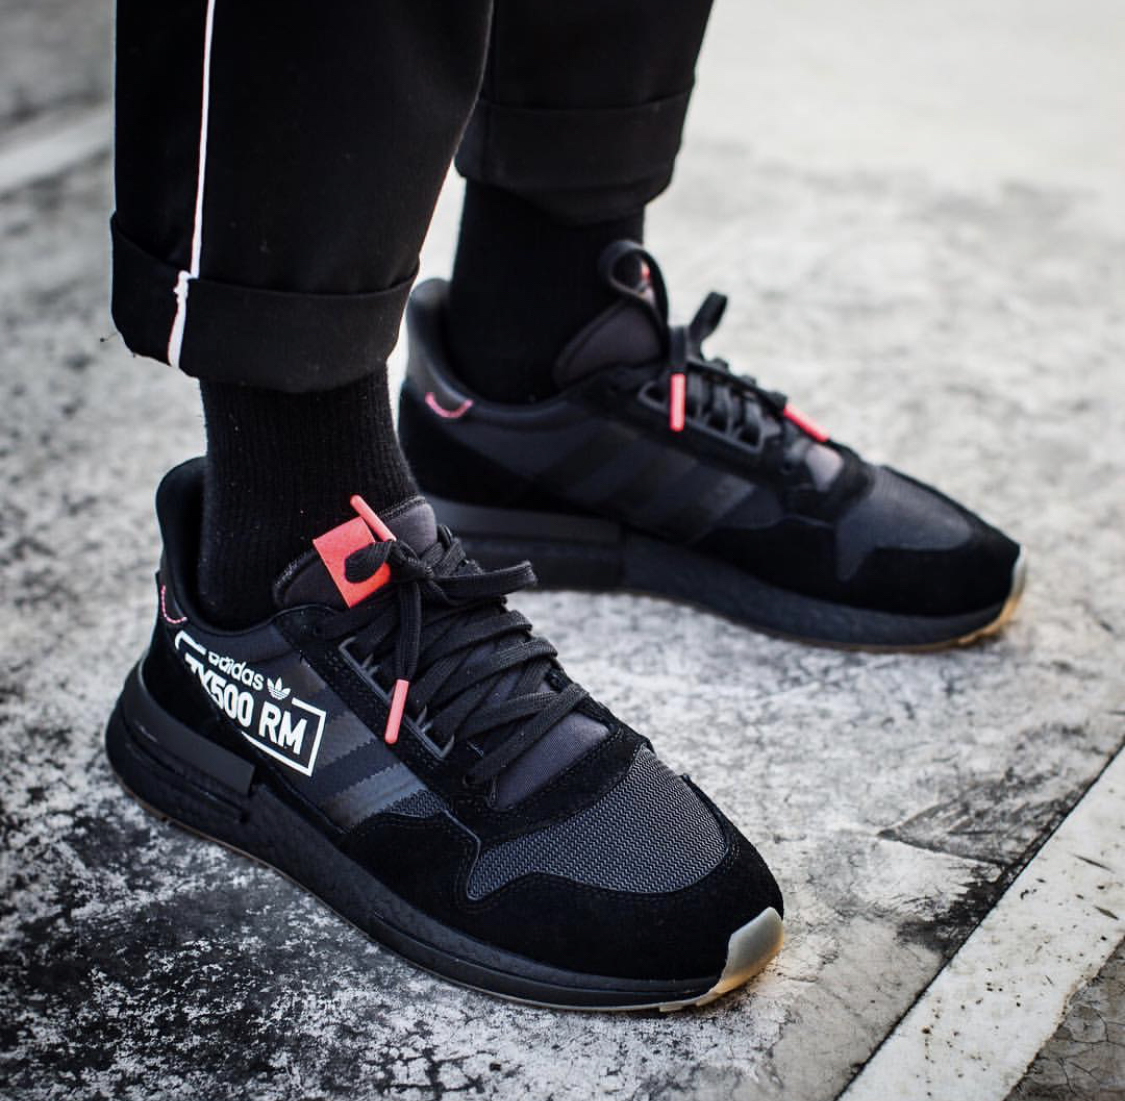 adidas zx 500 rm all black The Adidas